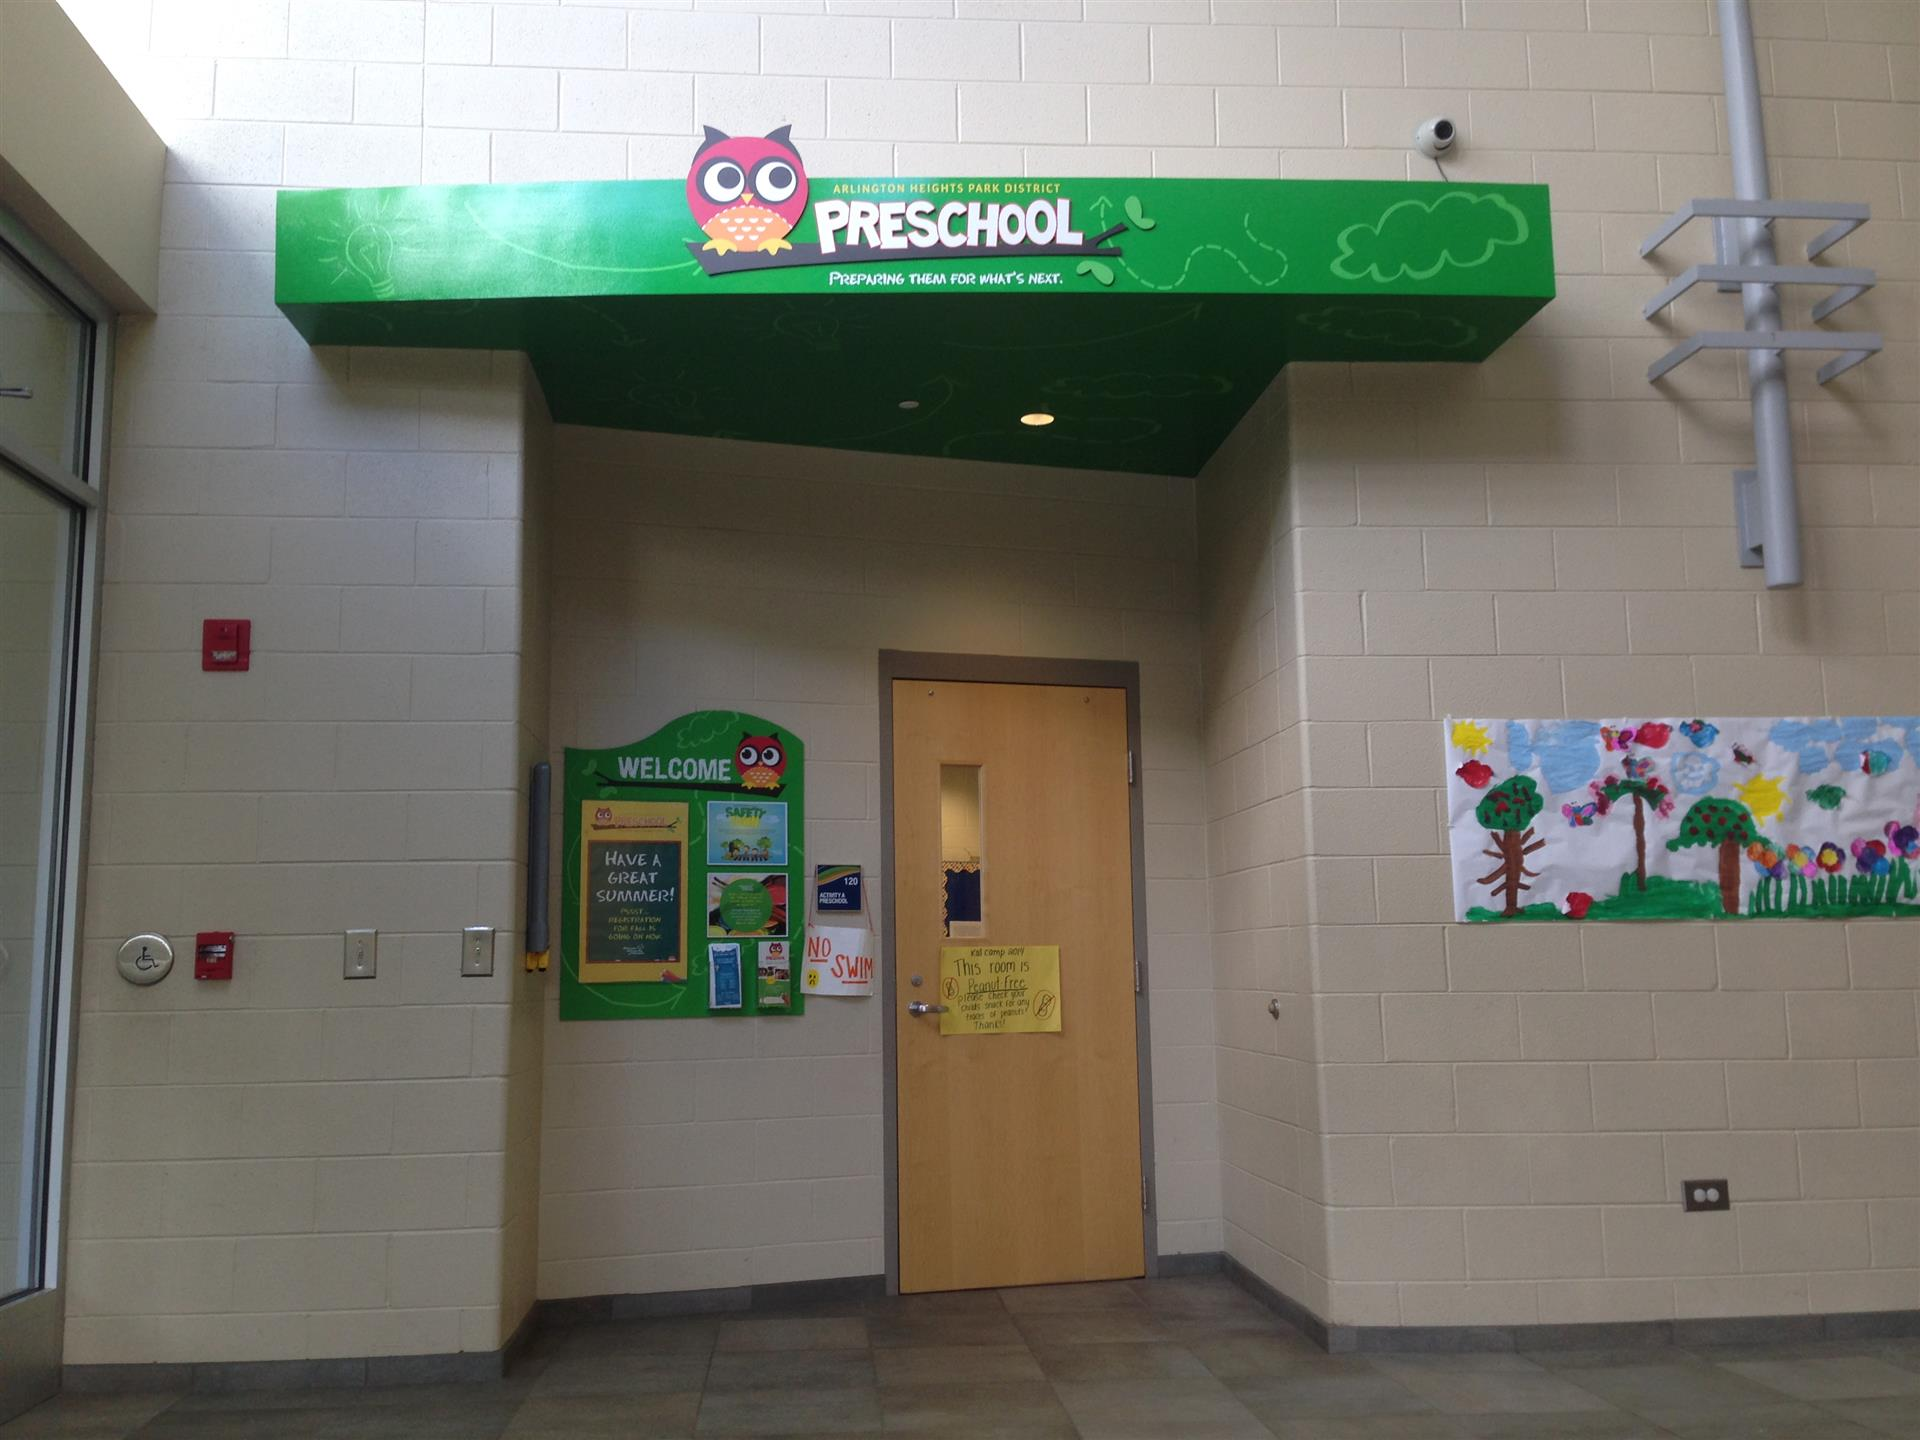 School Building Environmental Sign